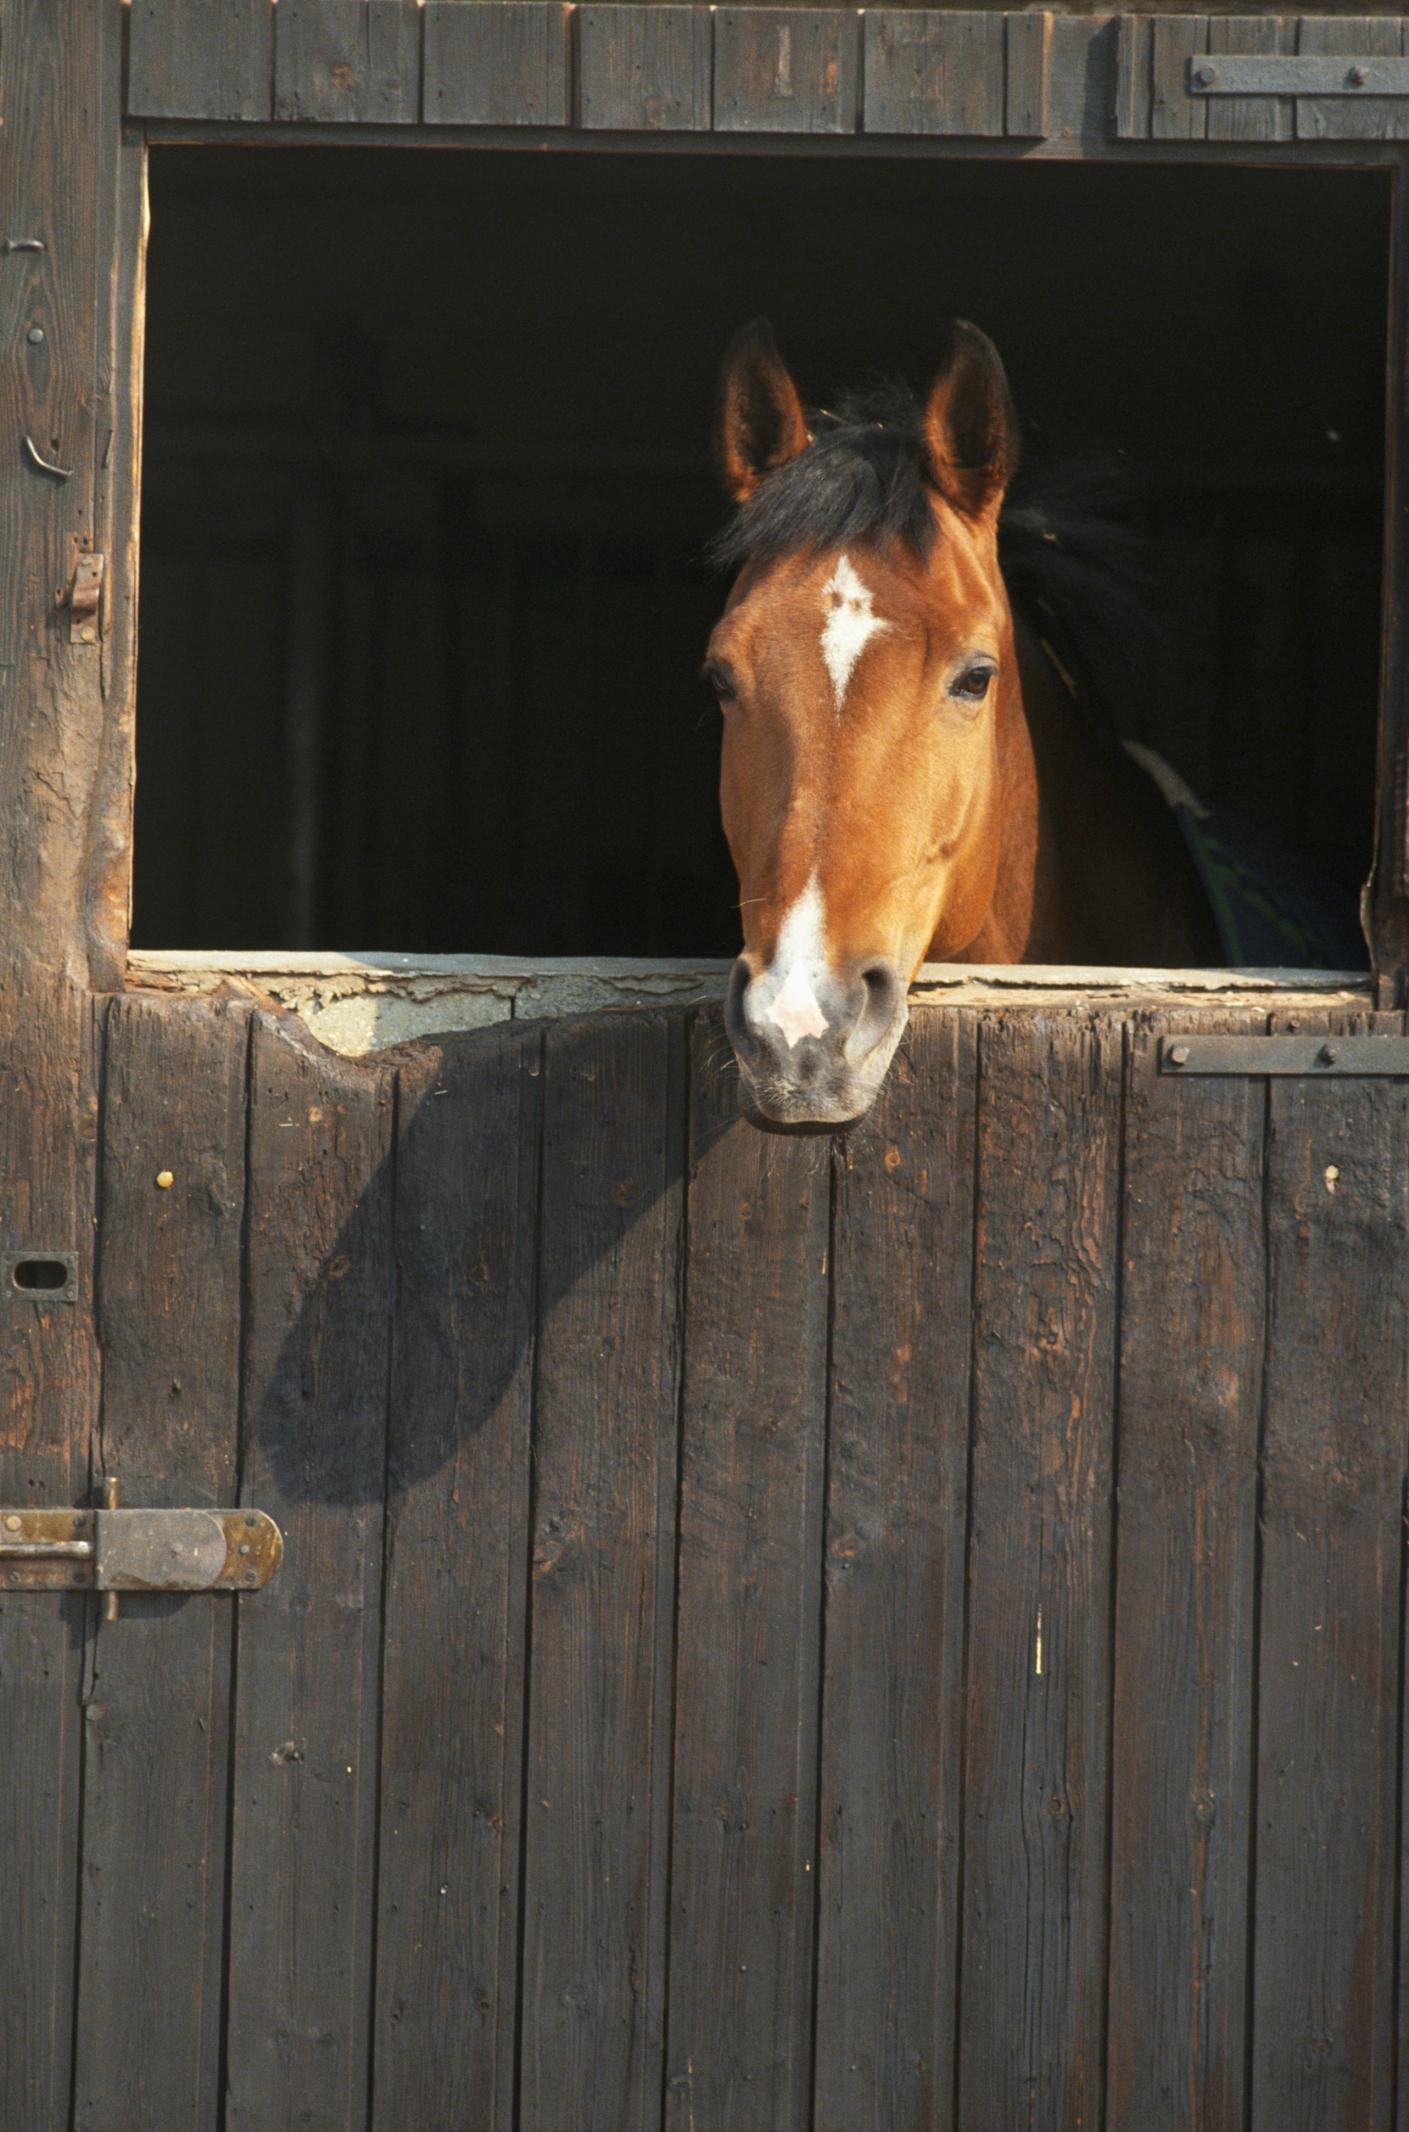 How To Build A Horse Stall Door Animals Mom Com